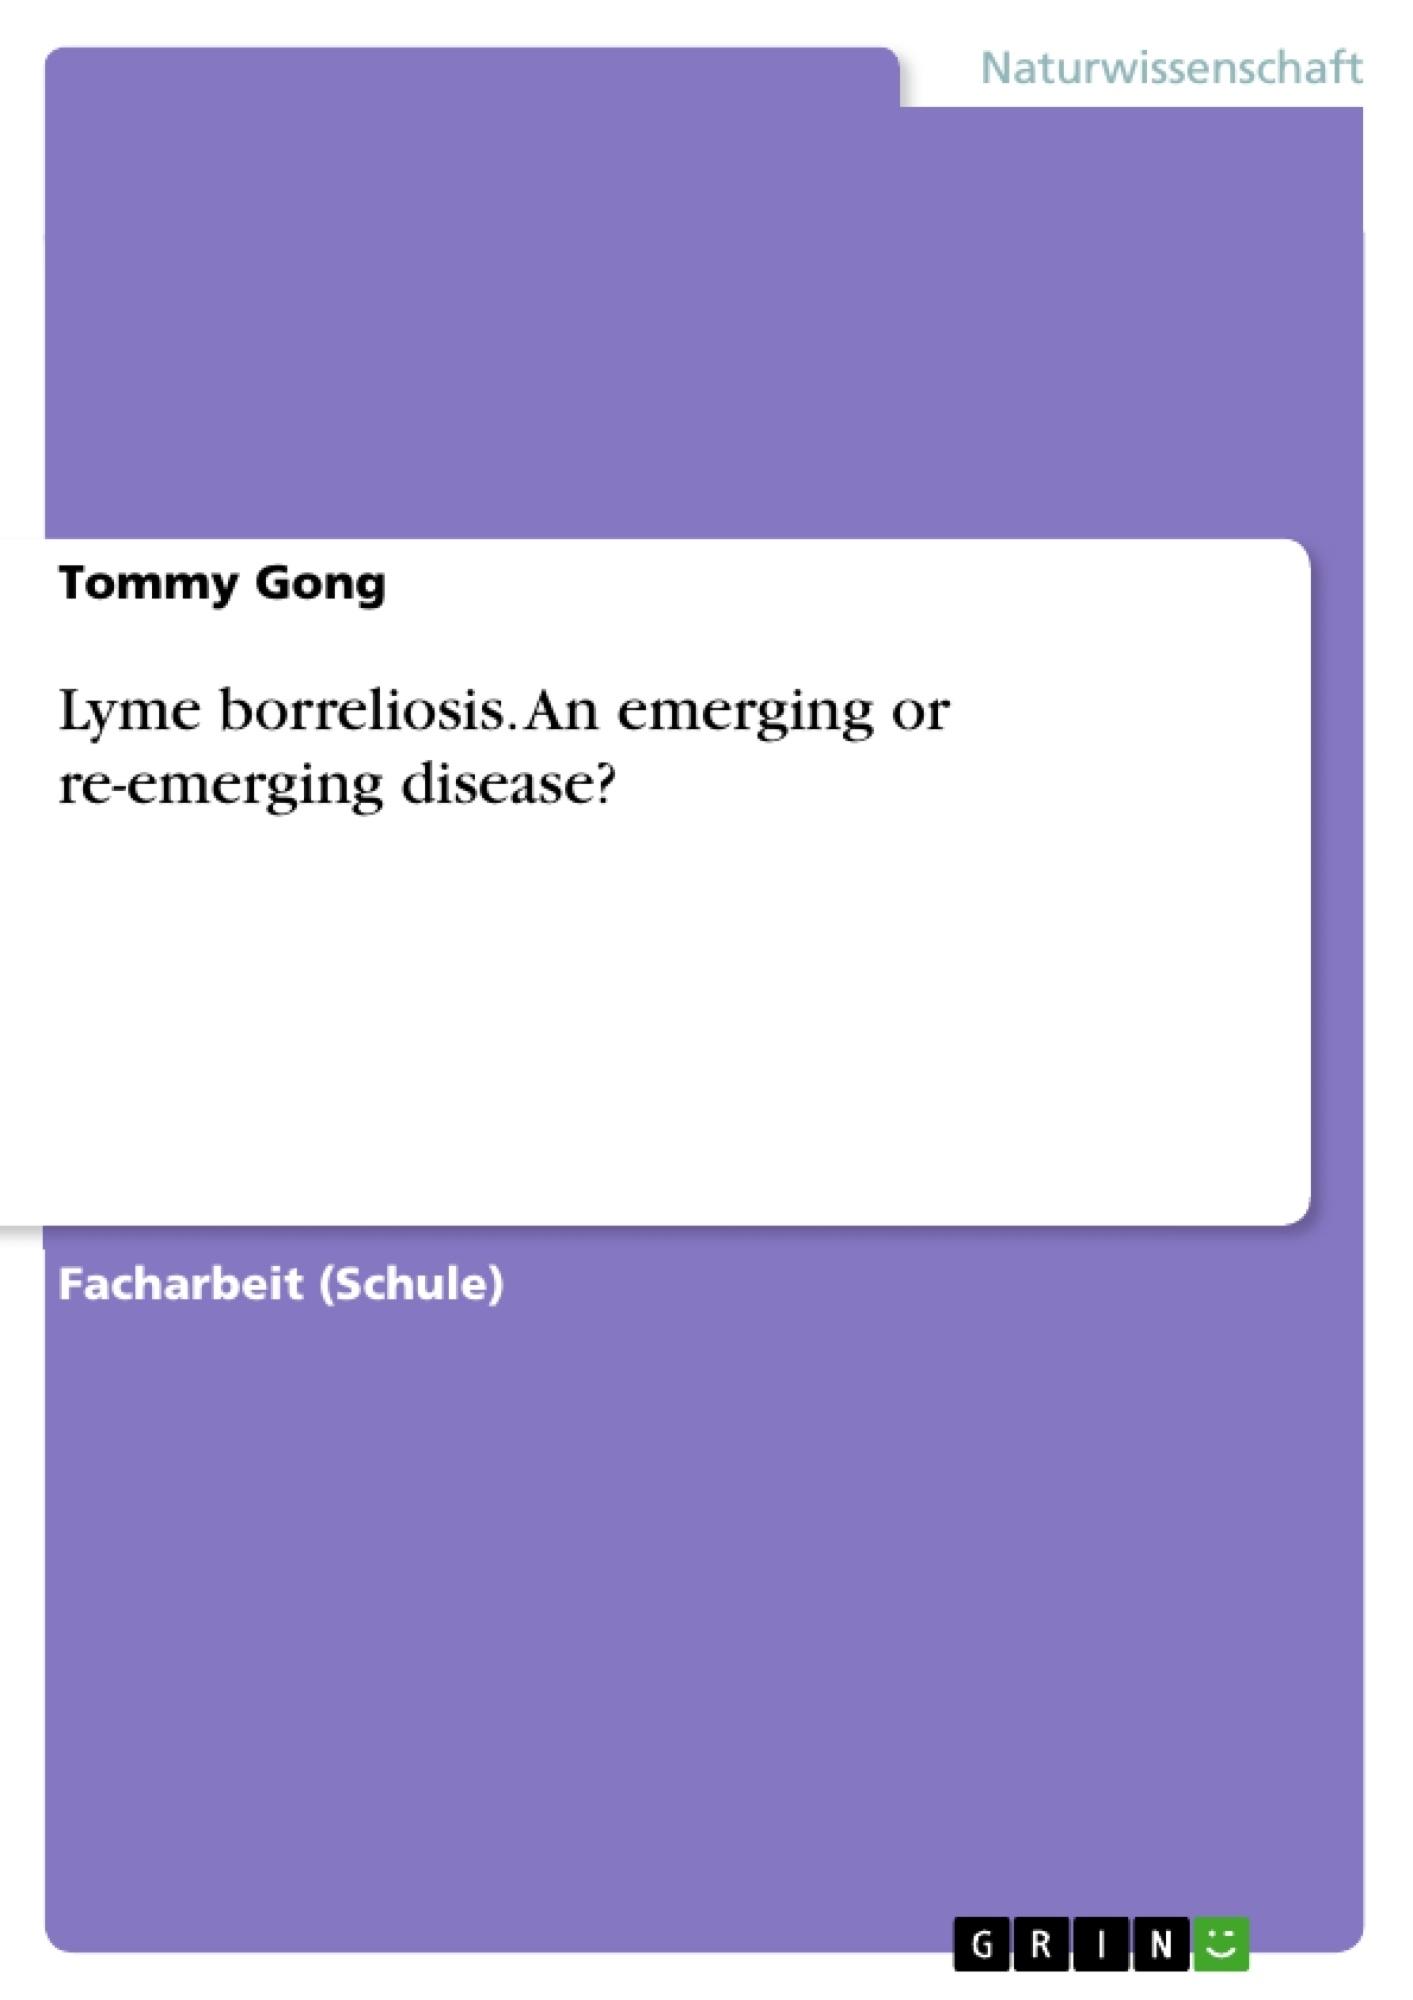 Titel: Lyme borreliosis. An emerging or re-emerging disease?